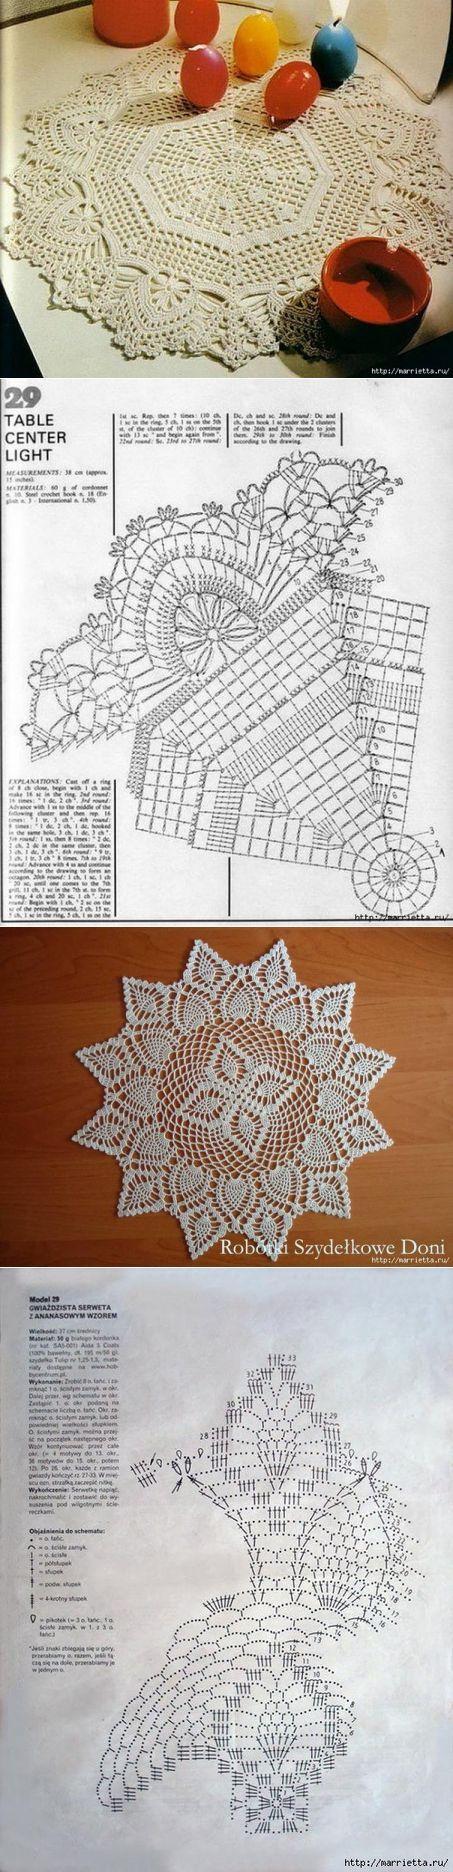 794 best Patterns images on Pinterest   Crochet patterns, Crochet ...